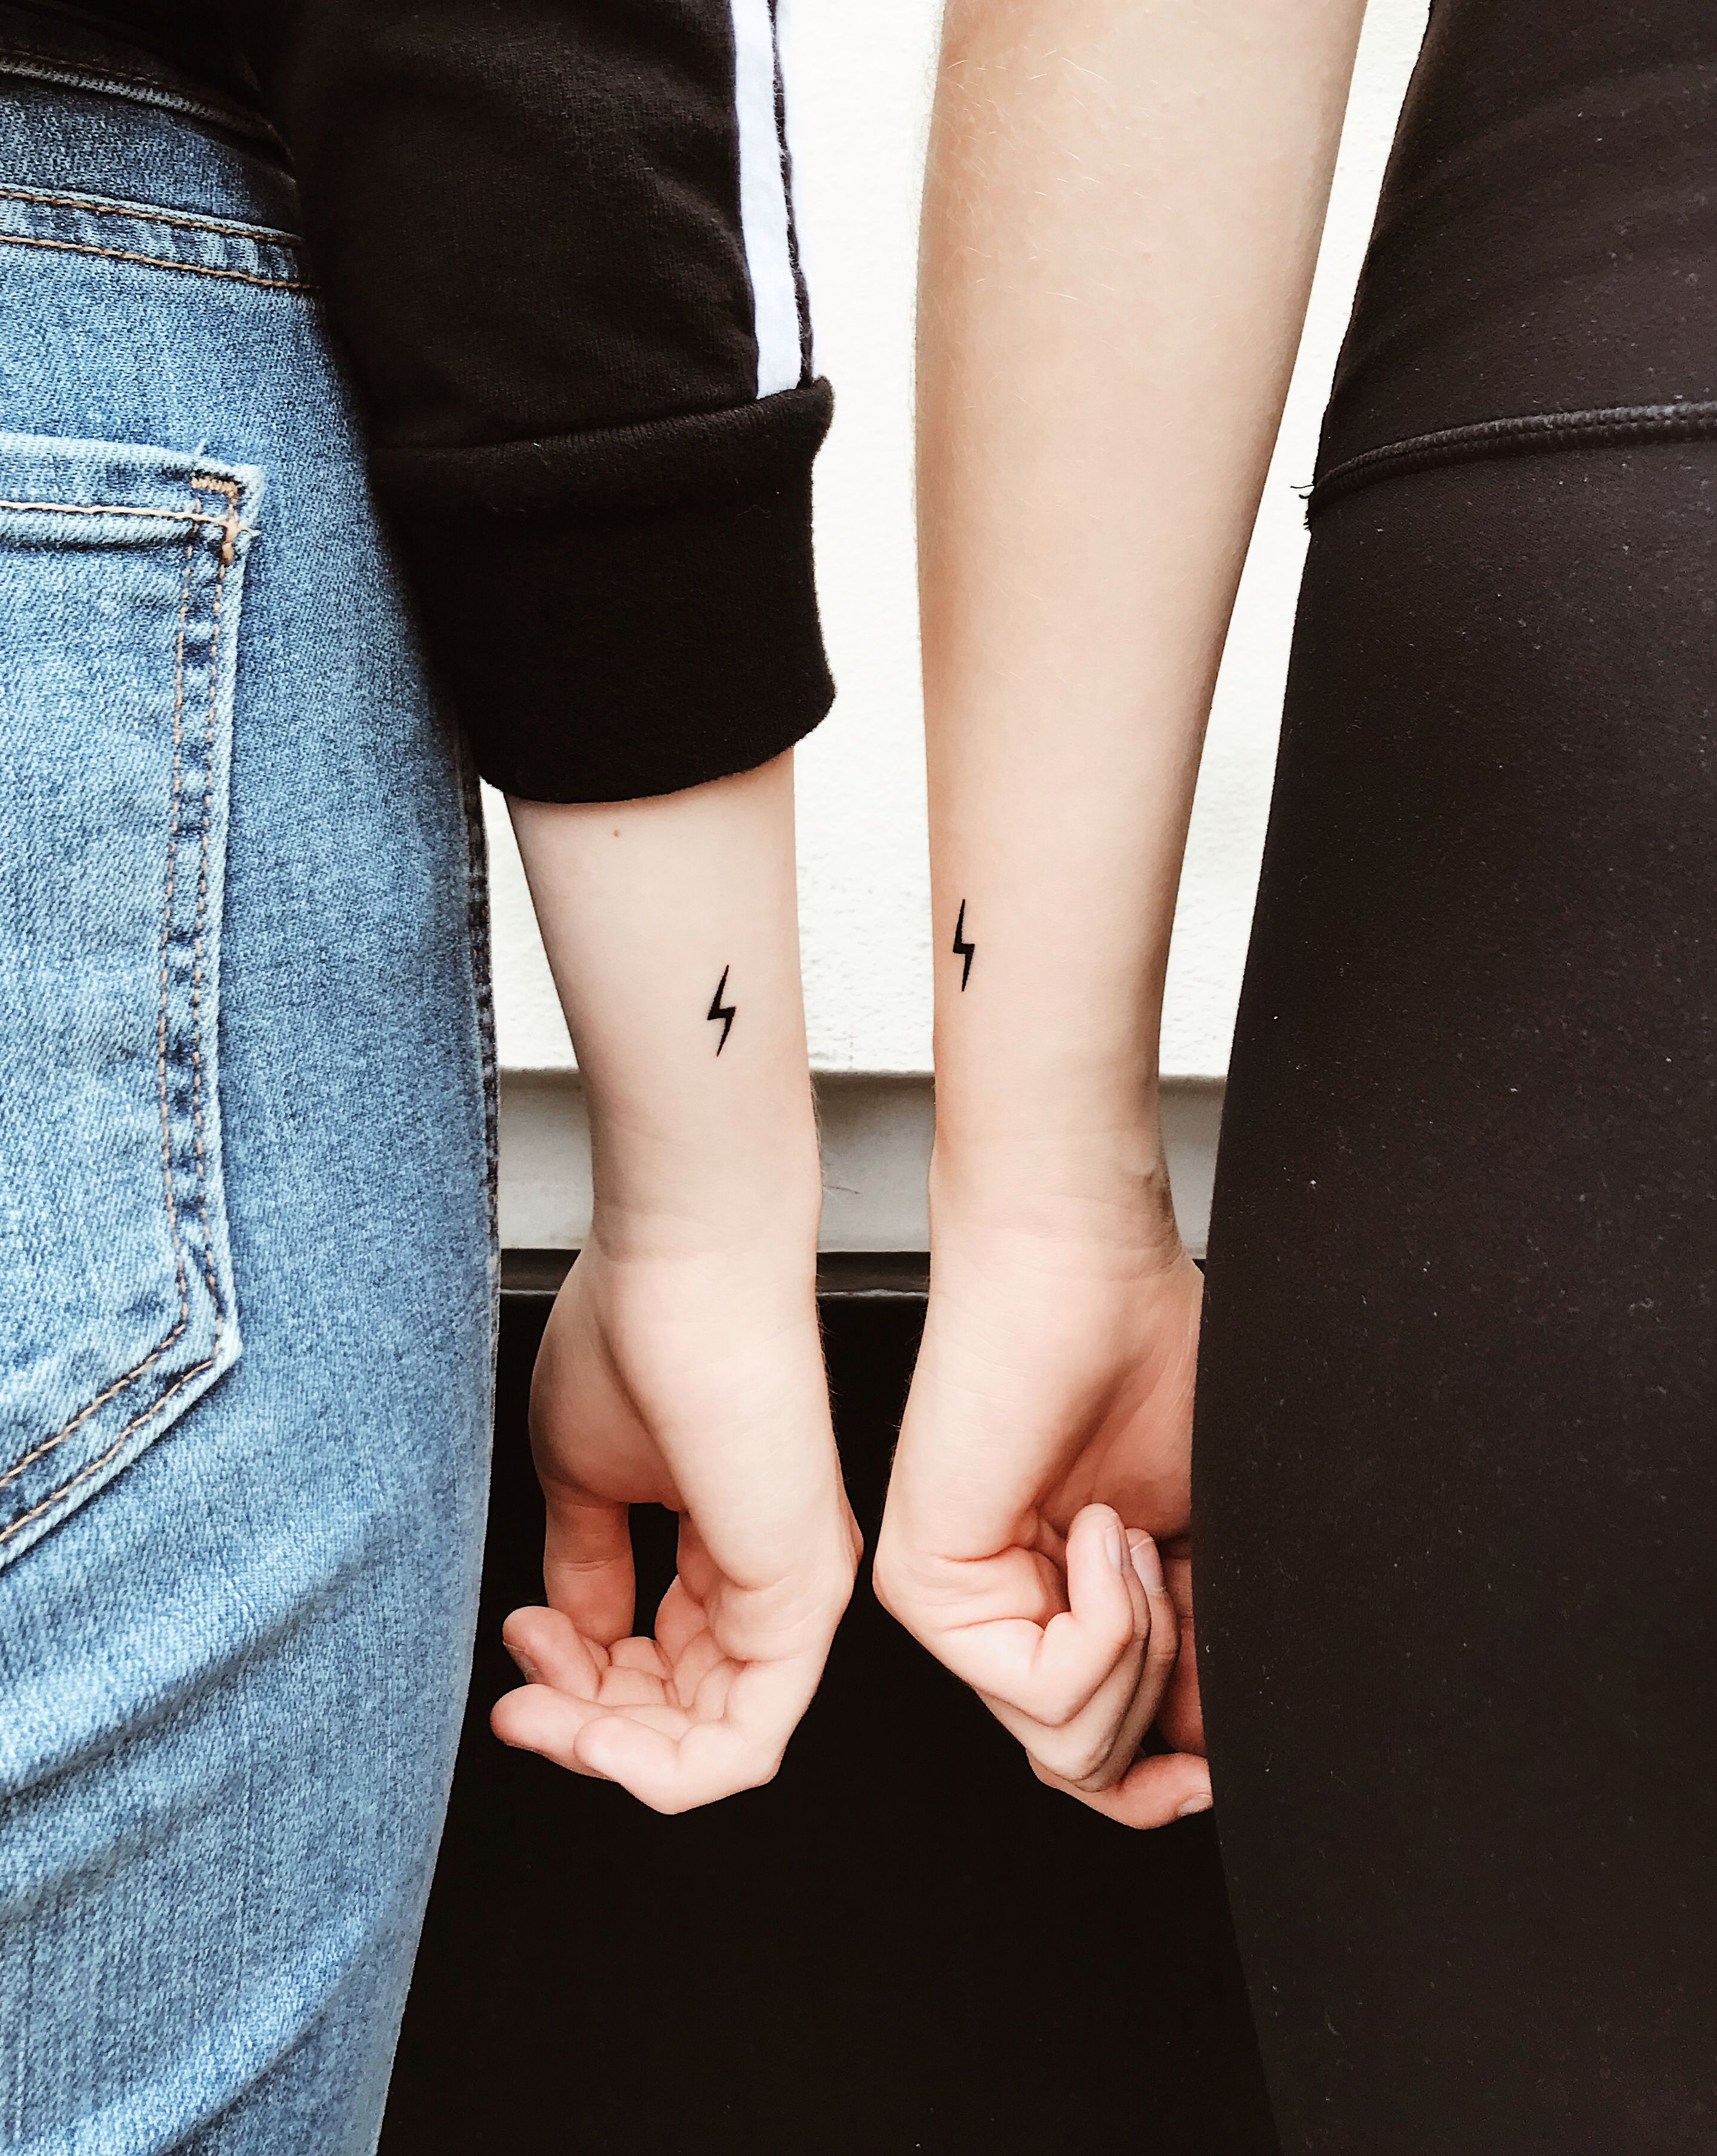 Matching Tiny Tattoos Tiny Tattoos Tiny Harry Potter Tattoos Subtle Tattoos